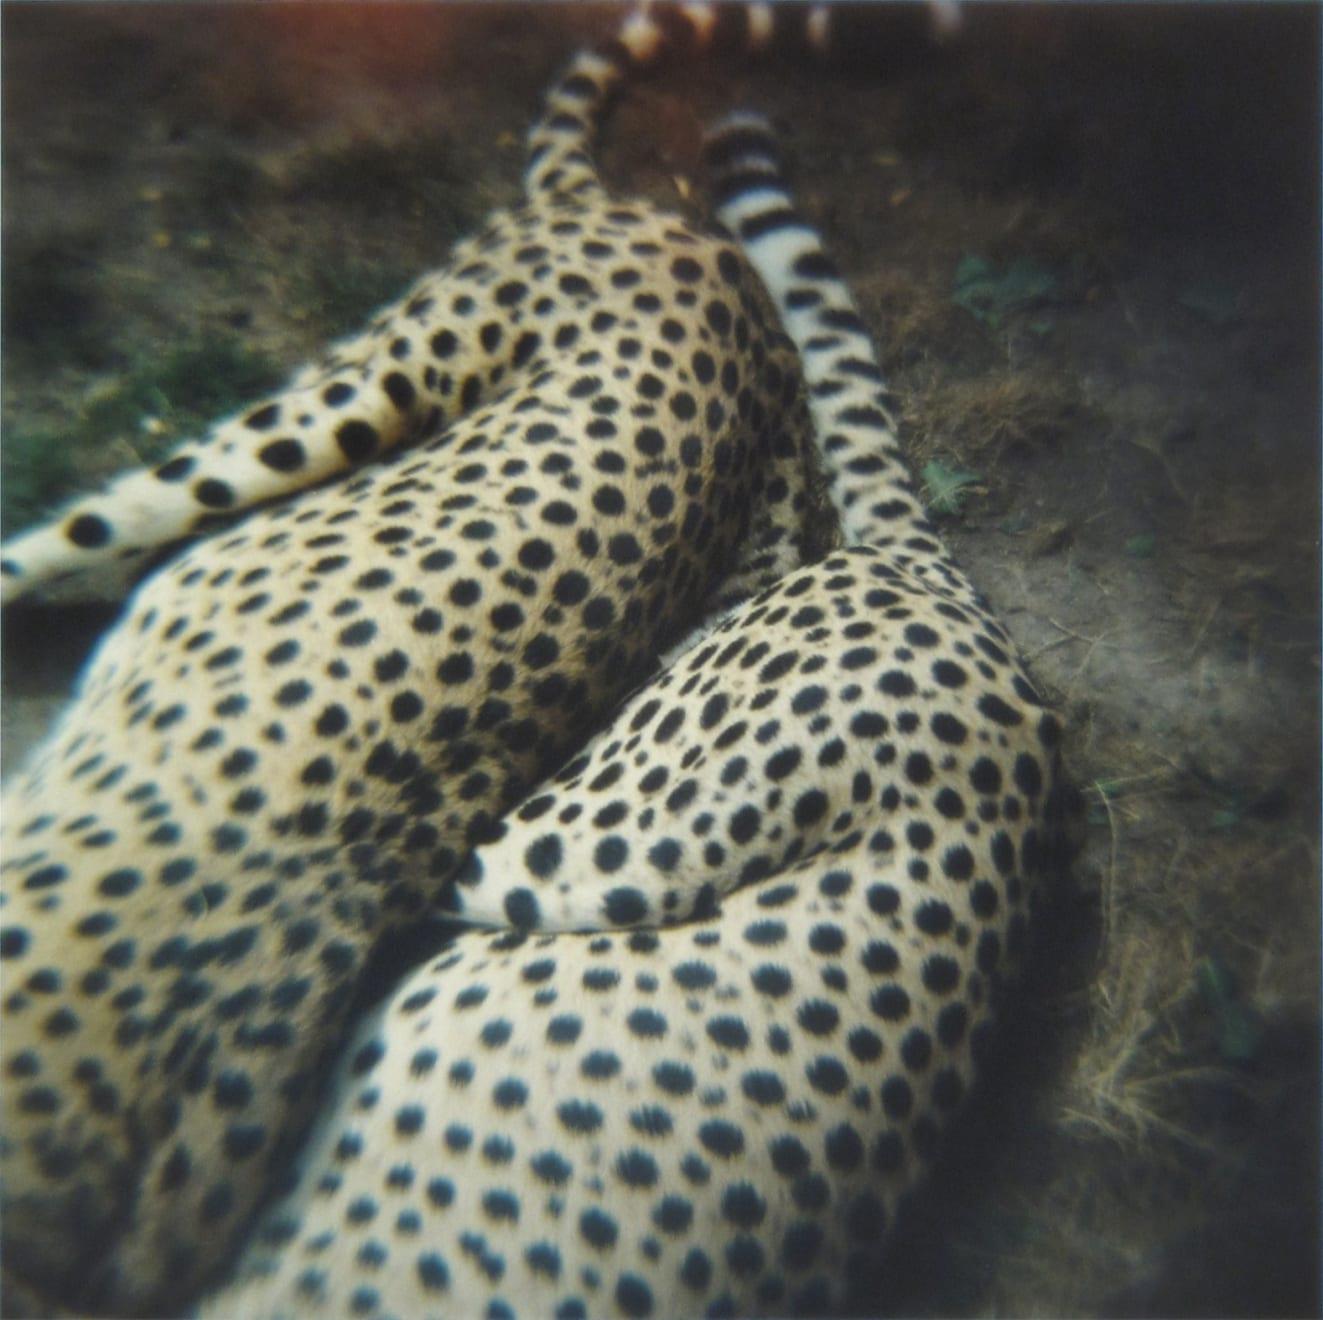 Amy Blakemore Cheetahs, 2018 chromogenic print 15 x 15 in (38.1 x 38.1 cm) ABL 244 $3,000